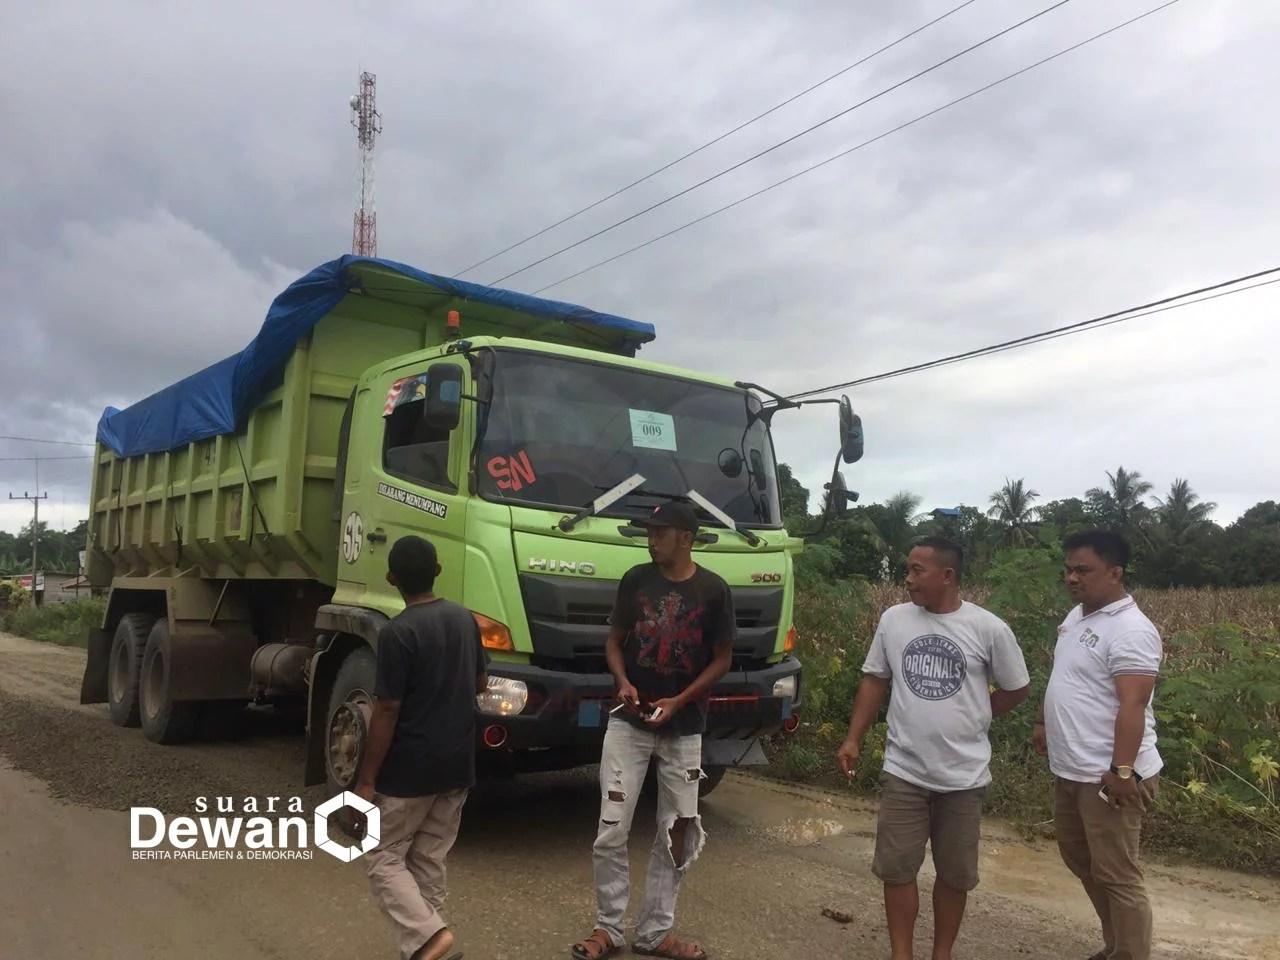 Tahan Mobil PT. Jhonlin, Warga Lombakasih Bombana Minta Jalan Diaspal Sebelum Dipakai